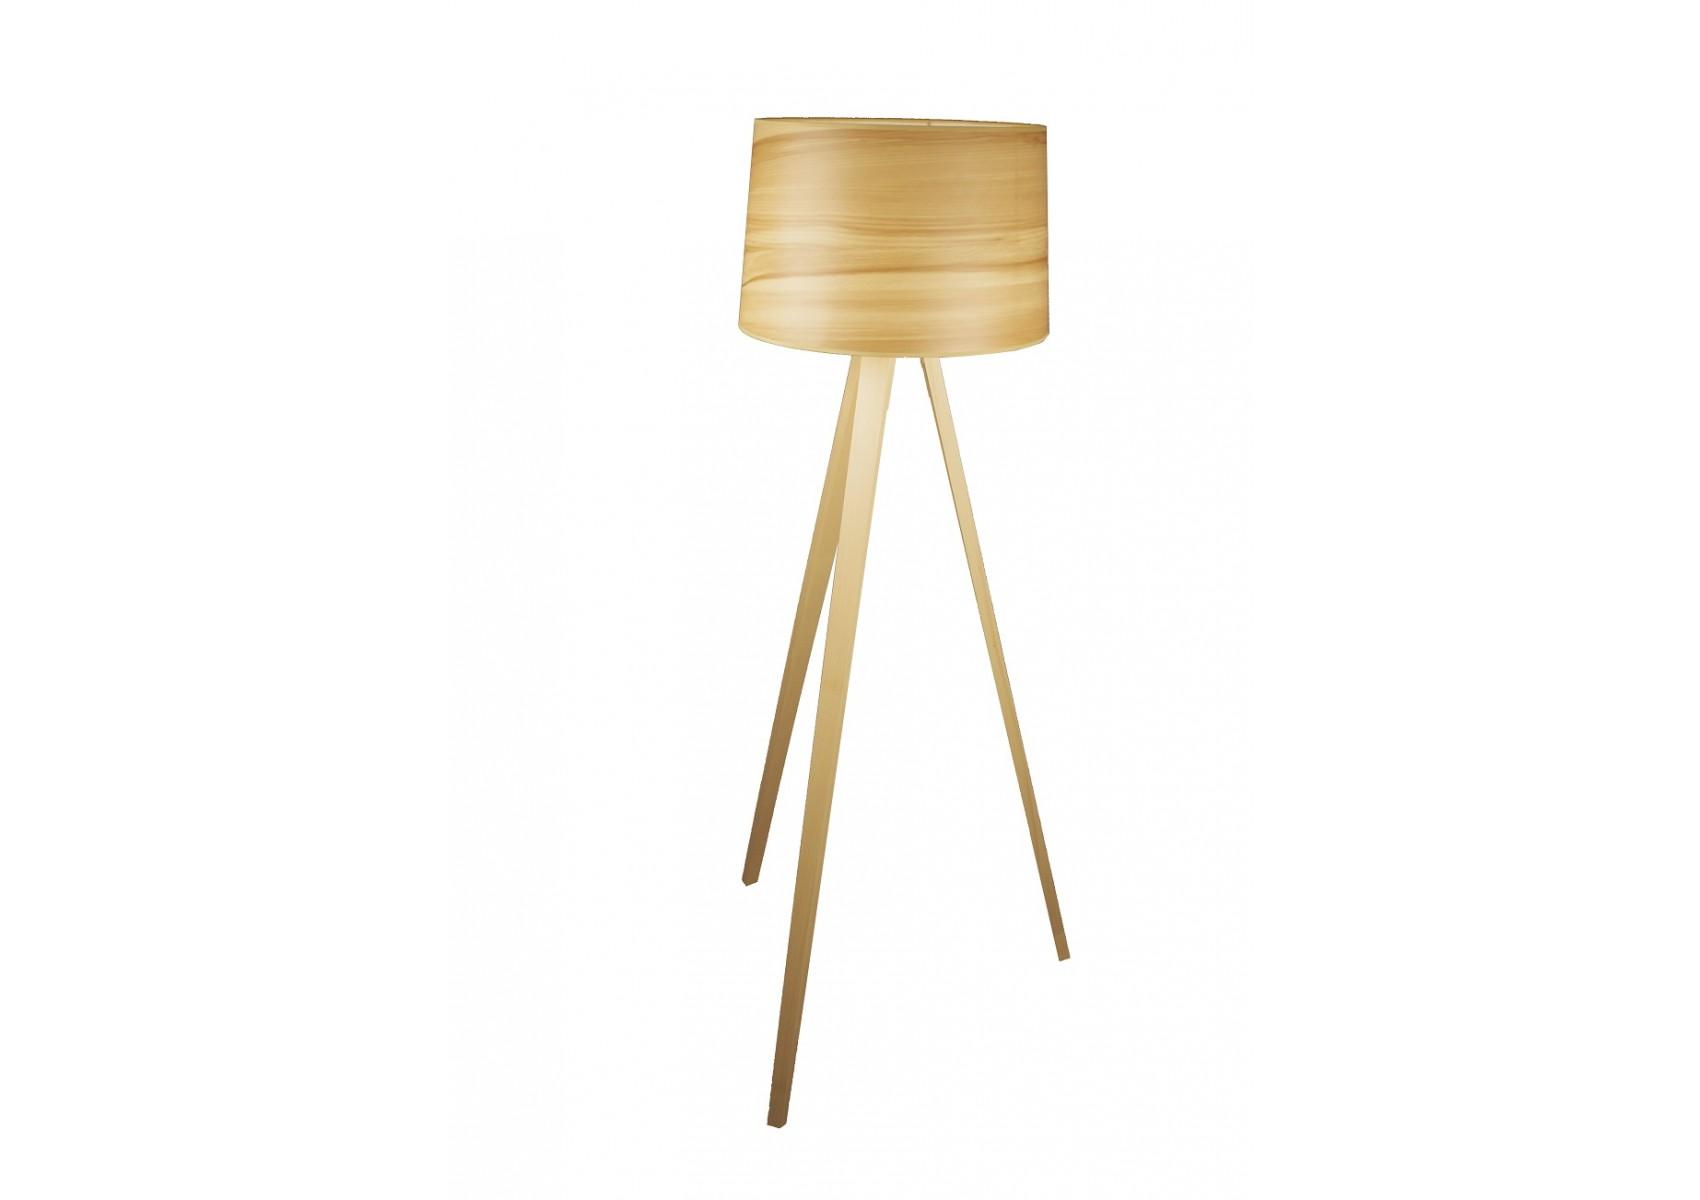 Lampadaire en bois design Essence par Aluminor # Lampadaire En Bois Design